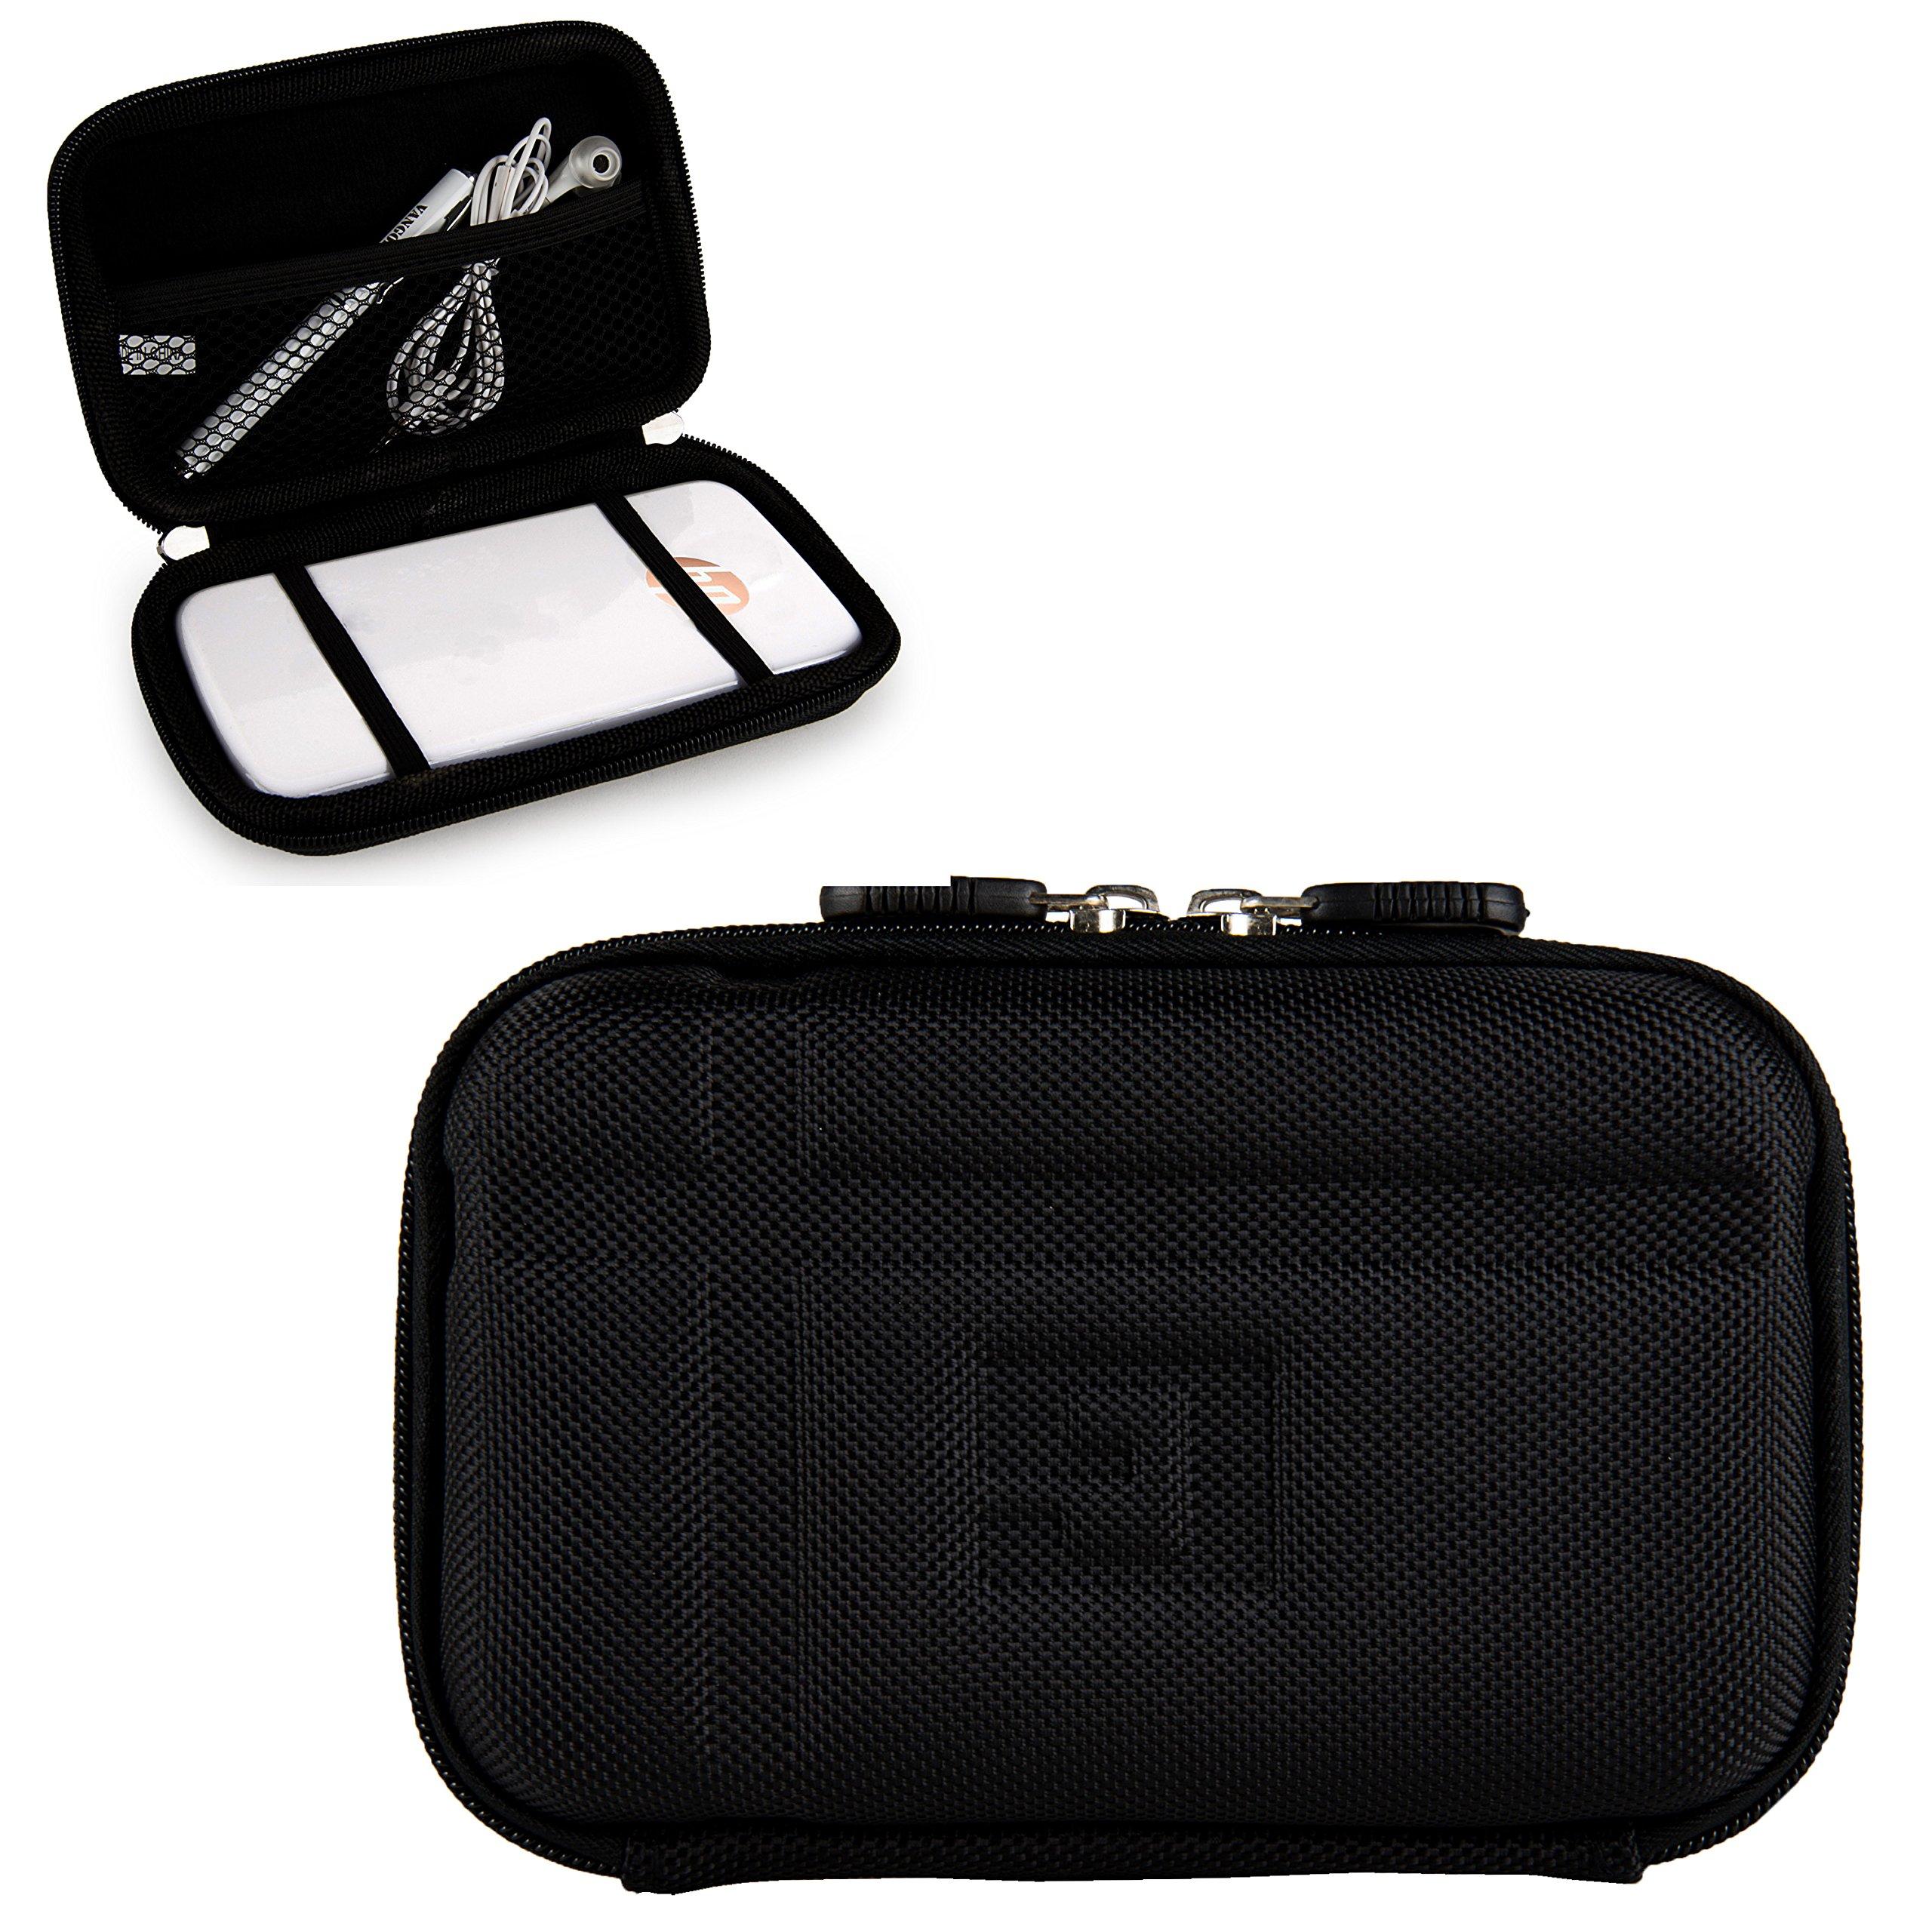 Protective Carrying Travel Storage Case Protective Portable for Kodak mini portable instant photo printer